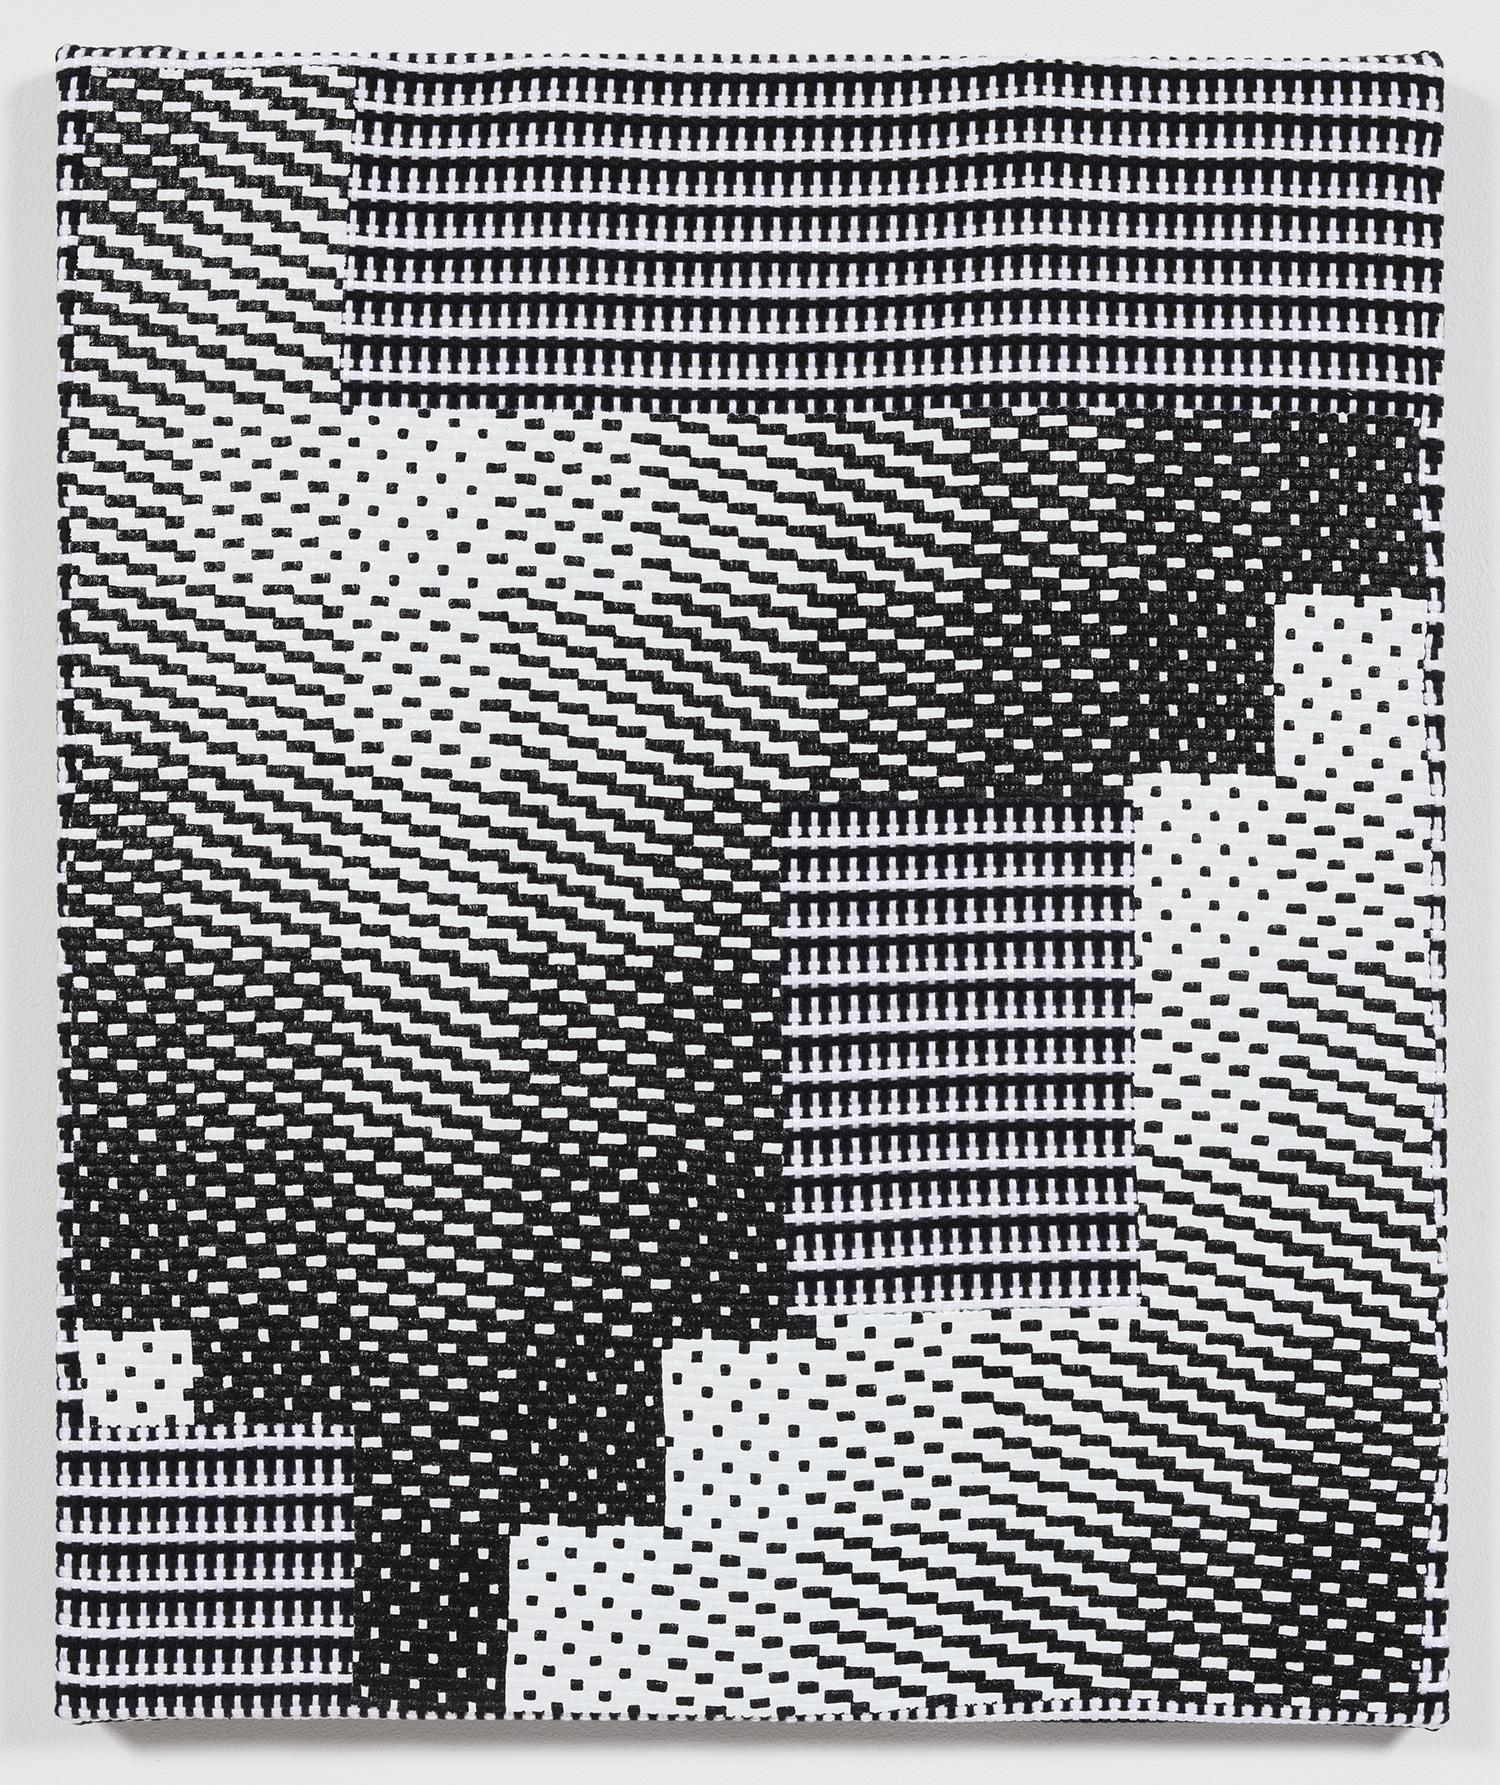 Samantha Bittman. <em>Untitled</em>, 2018. Acrylic on hand-woven textile, 24 x 20 inches (61 x 50.8 cm)